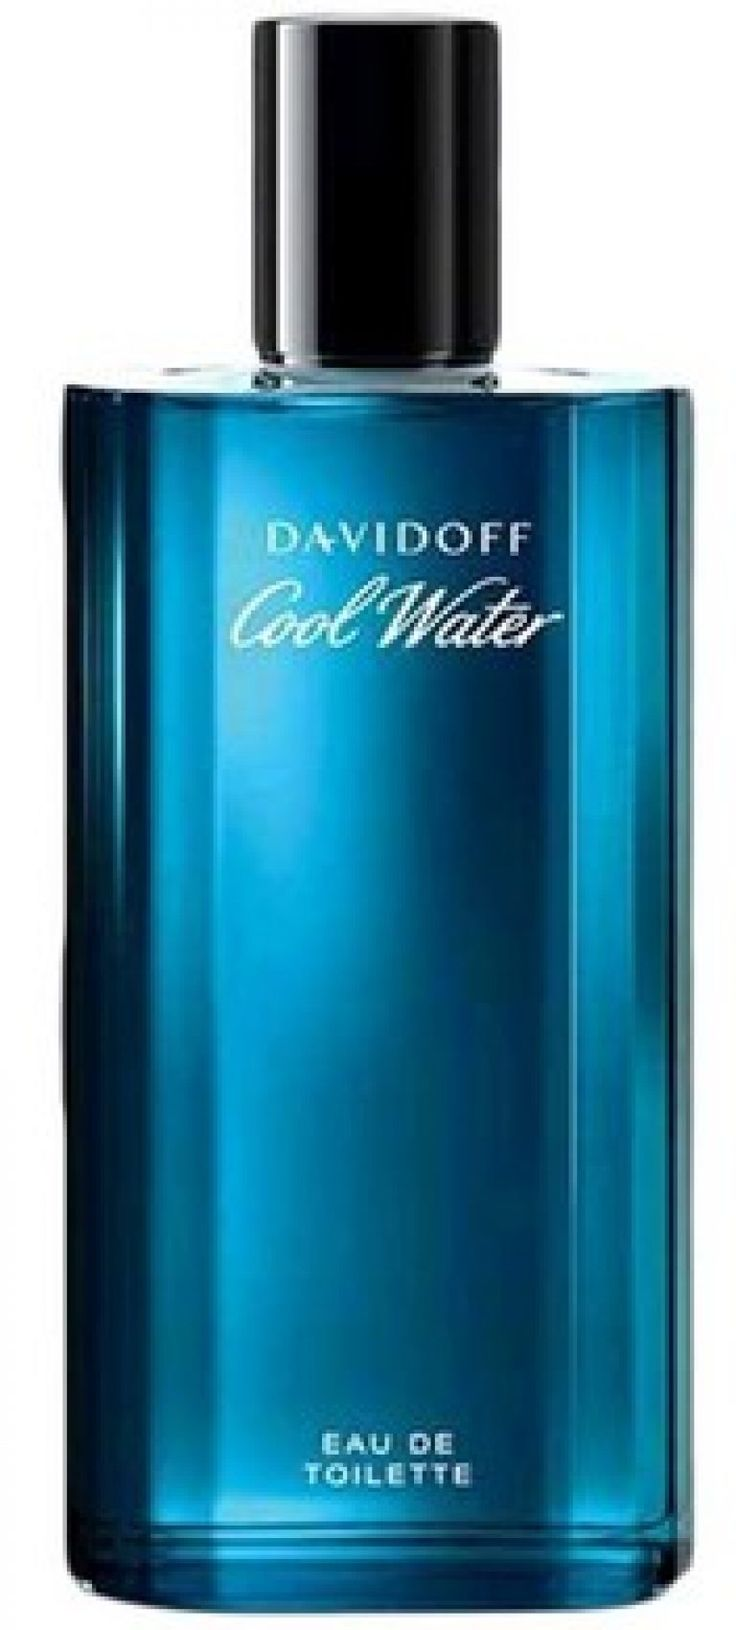 Davidoff Cool Water for Men sticla